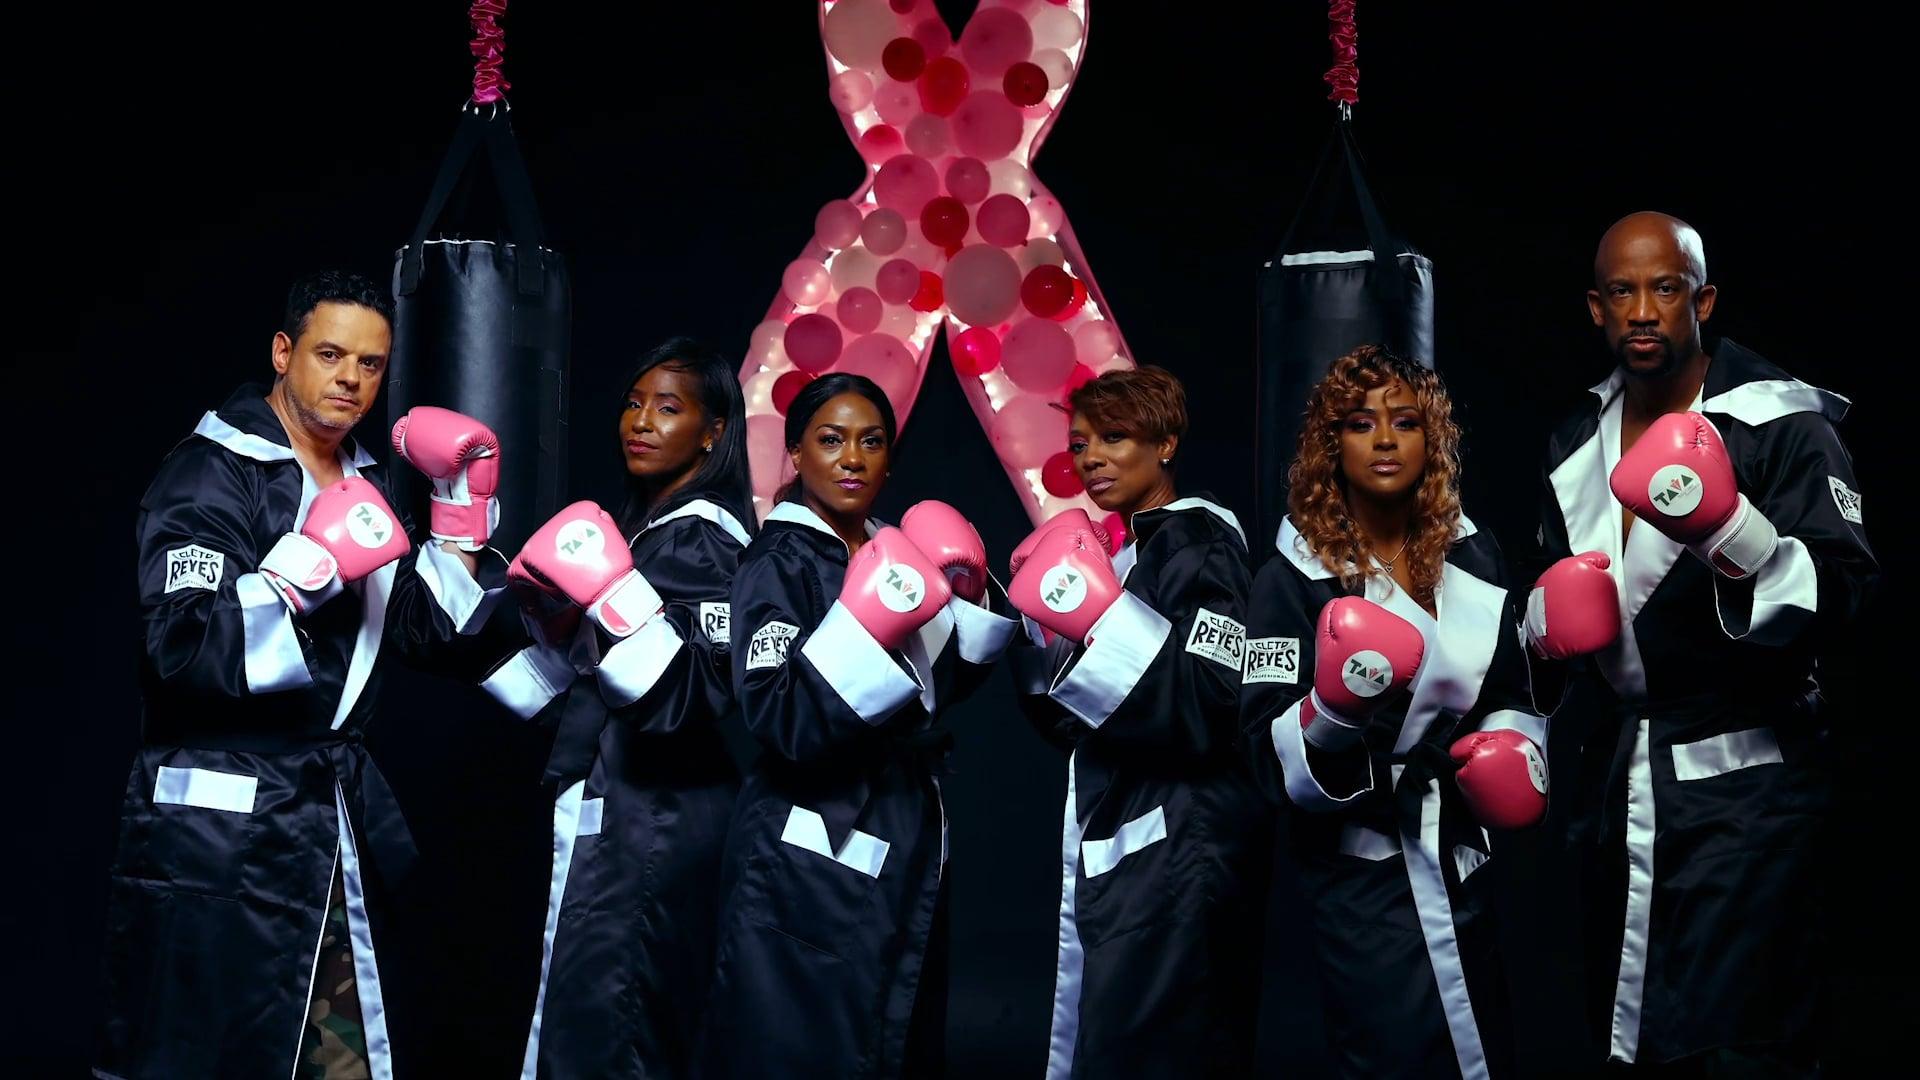 Kenny Lloyd Breast Cancer Awareness Campaign -  CoCo Studios